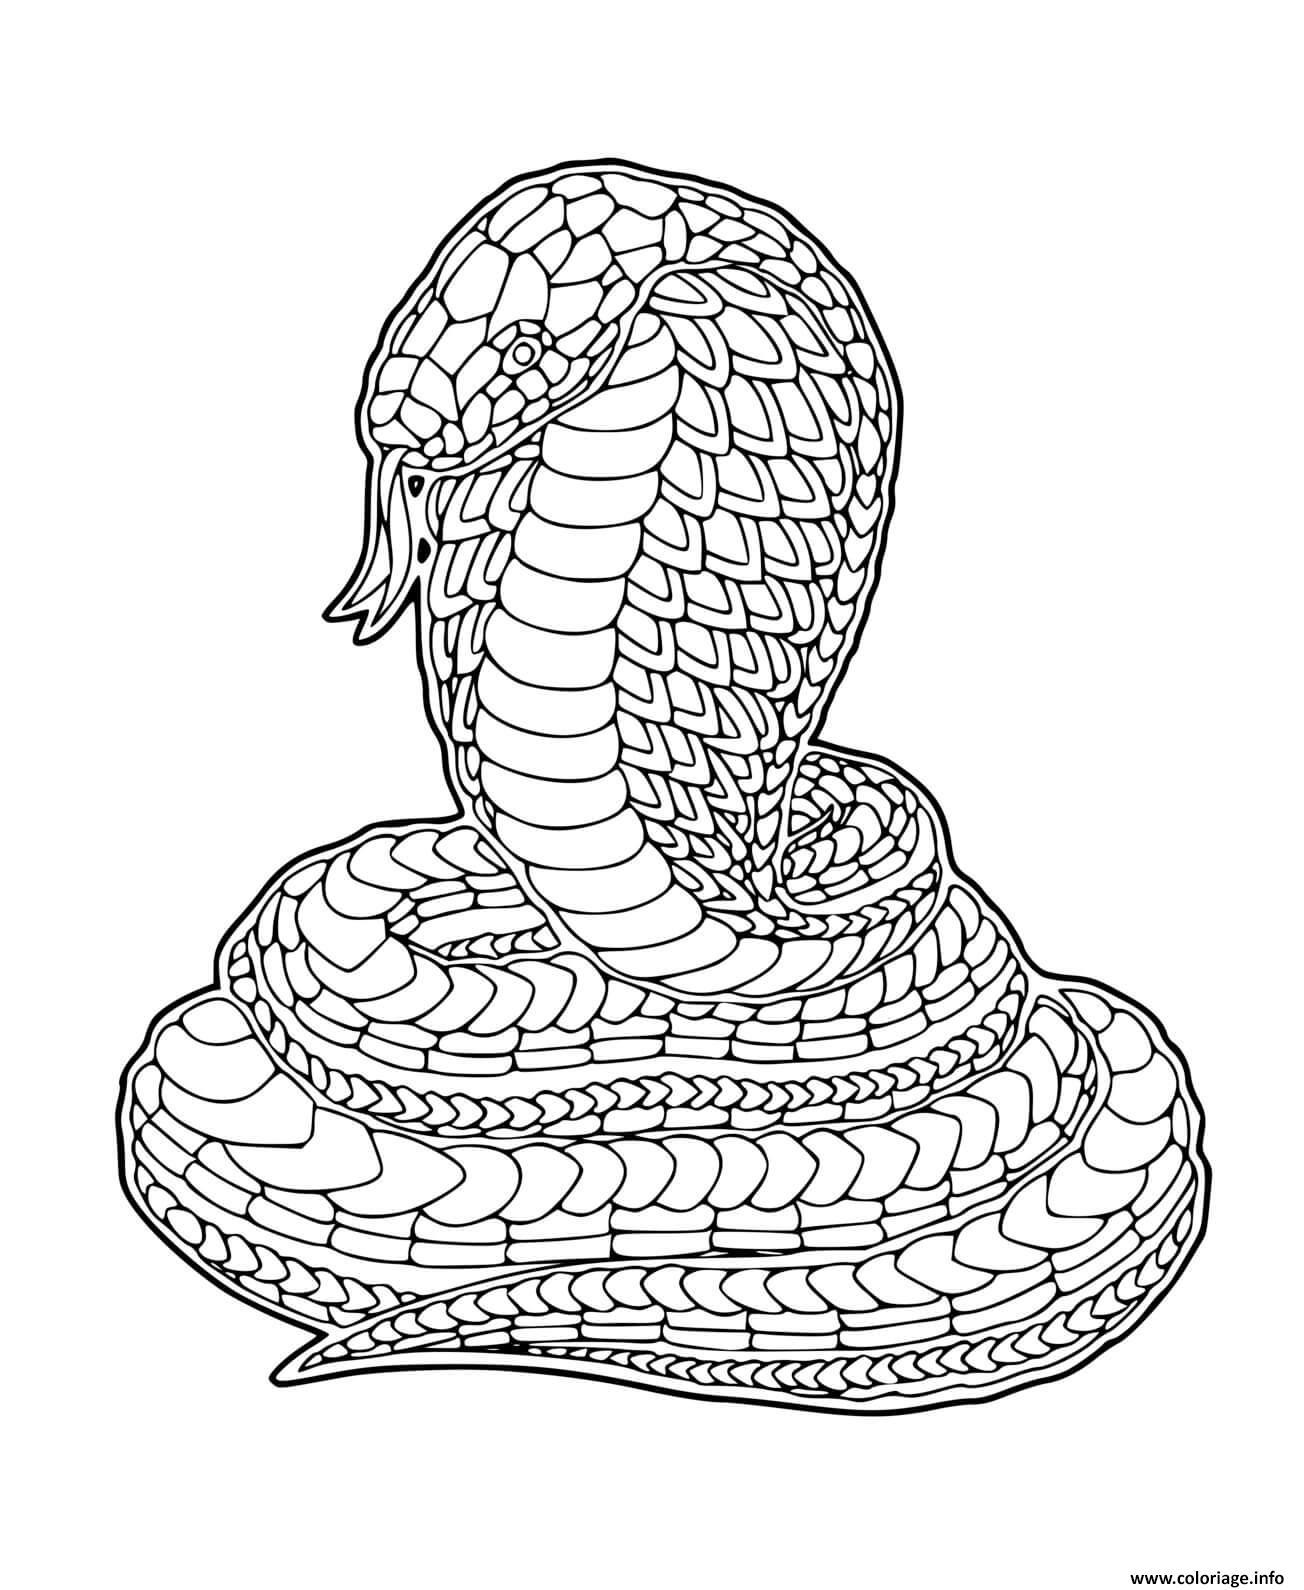 Dessin cobra zentangle Coloriage Gratuit à Imprimer